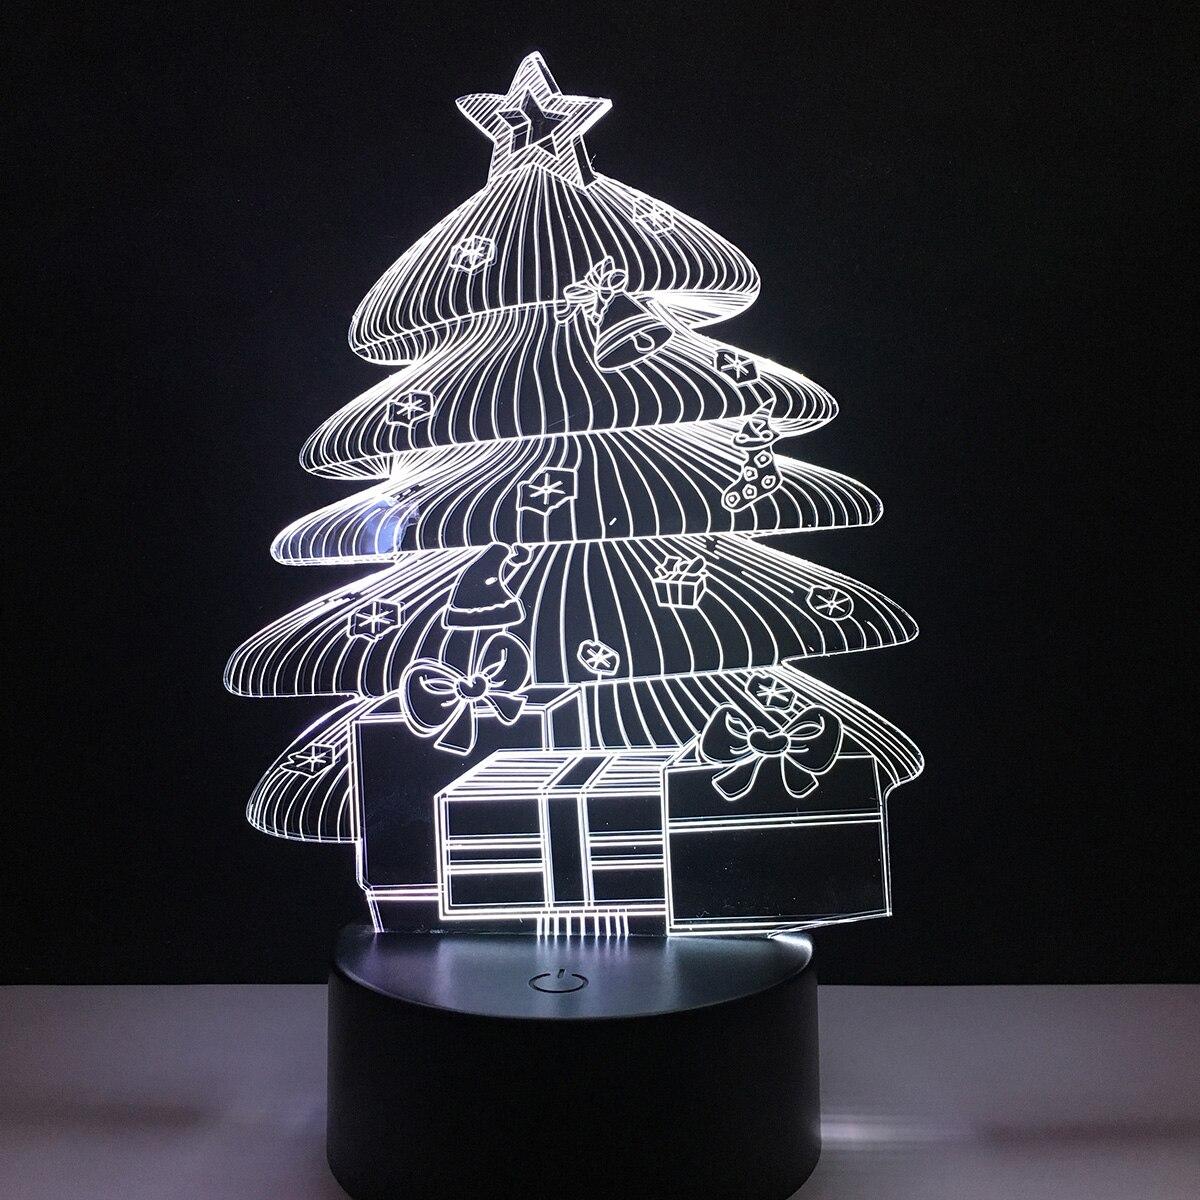 Christmas Tree 3D Holiday Light LED Lamp Home Room Decoracion 7 Colors Change Nightlight Kids Gift xmas gift series christmas decorations for home 3d lamp led night light luminaria santa claus tree snow man bear fish kids toys